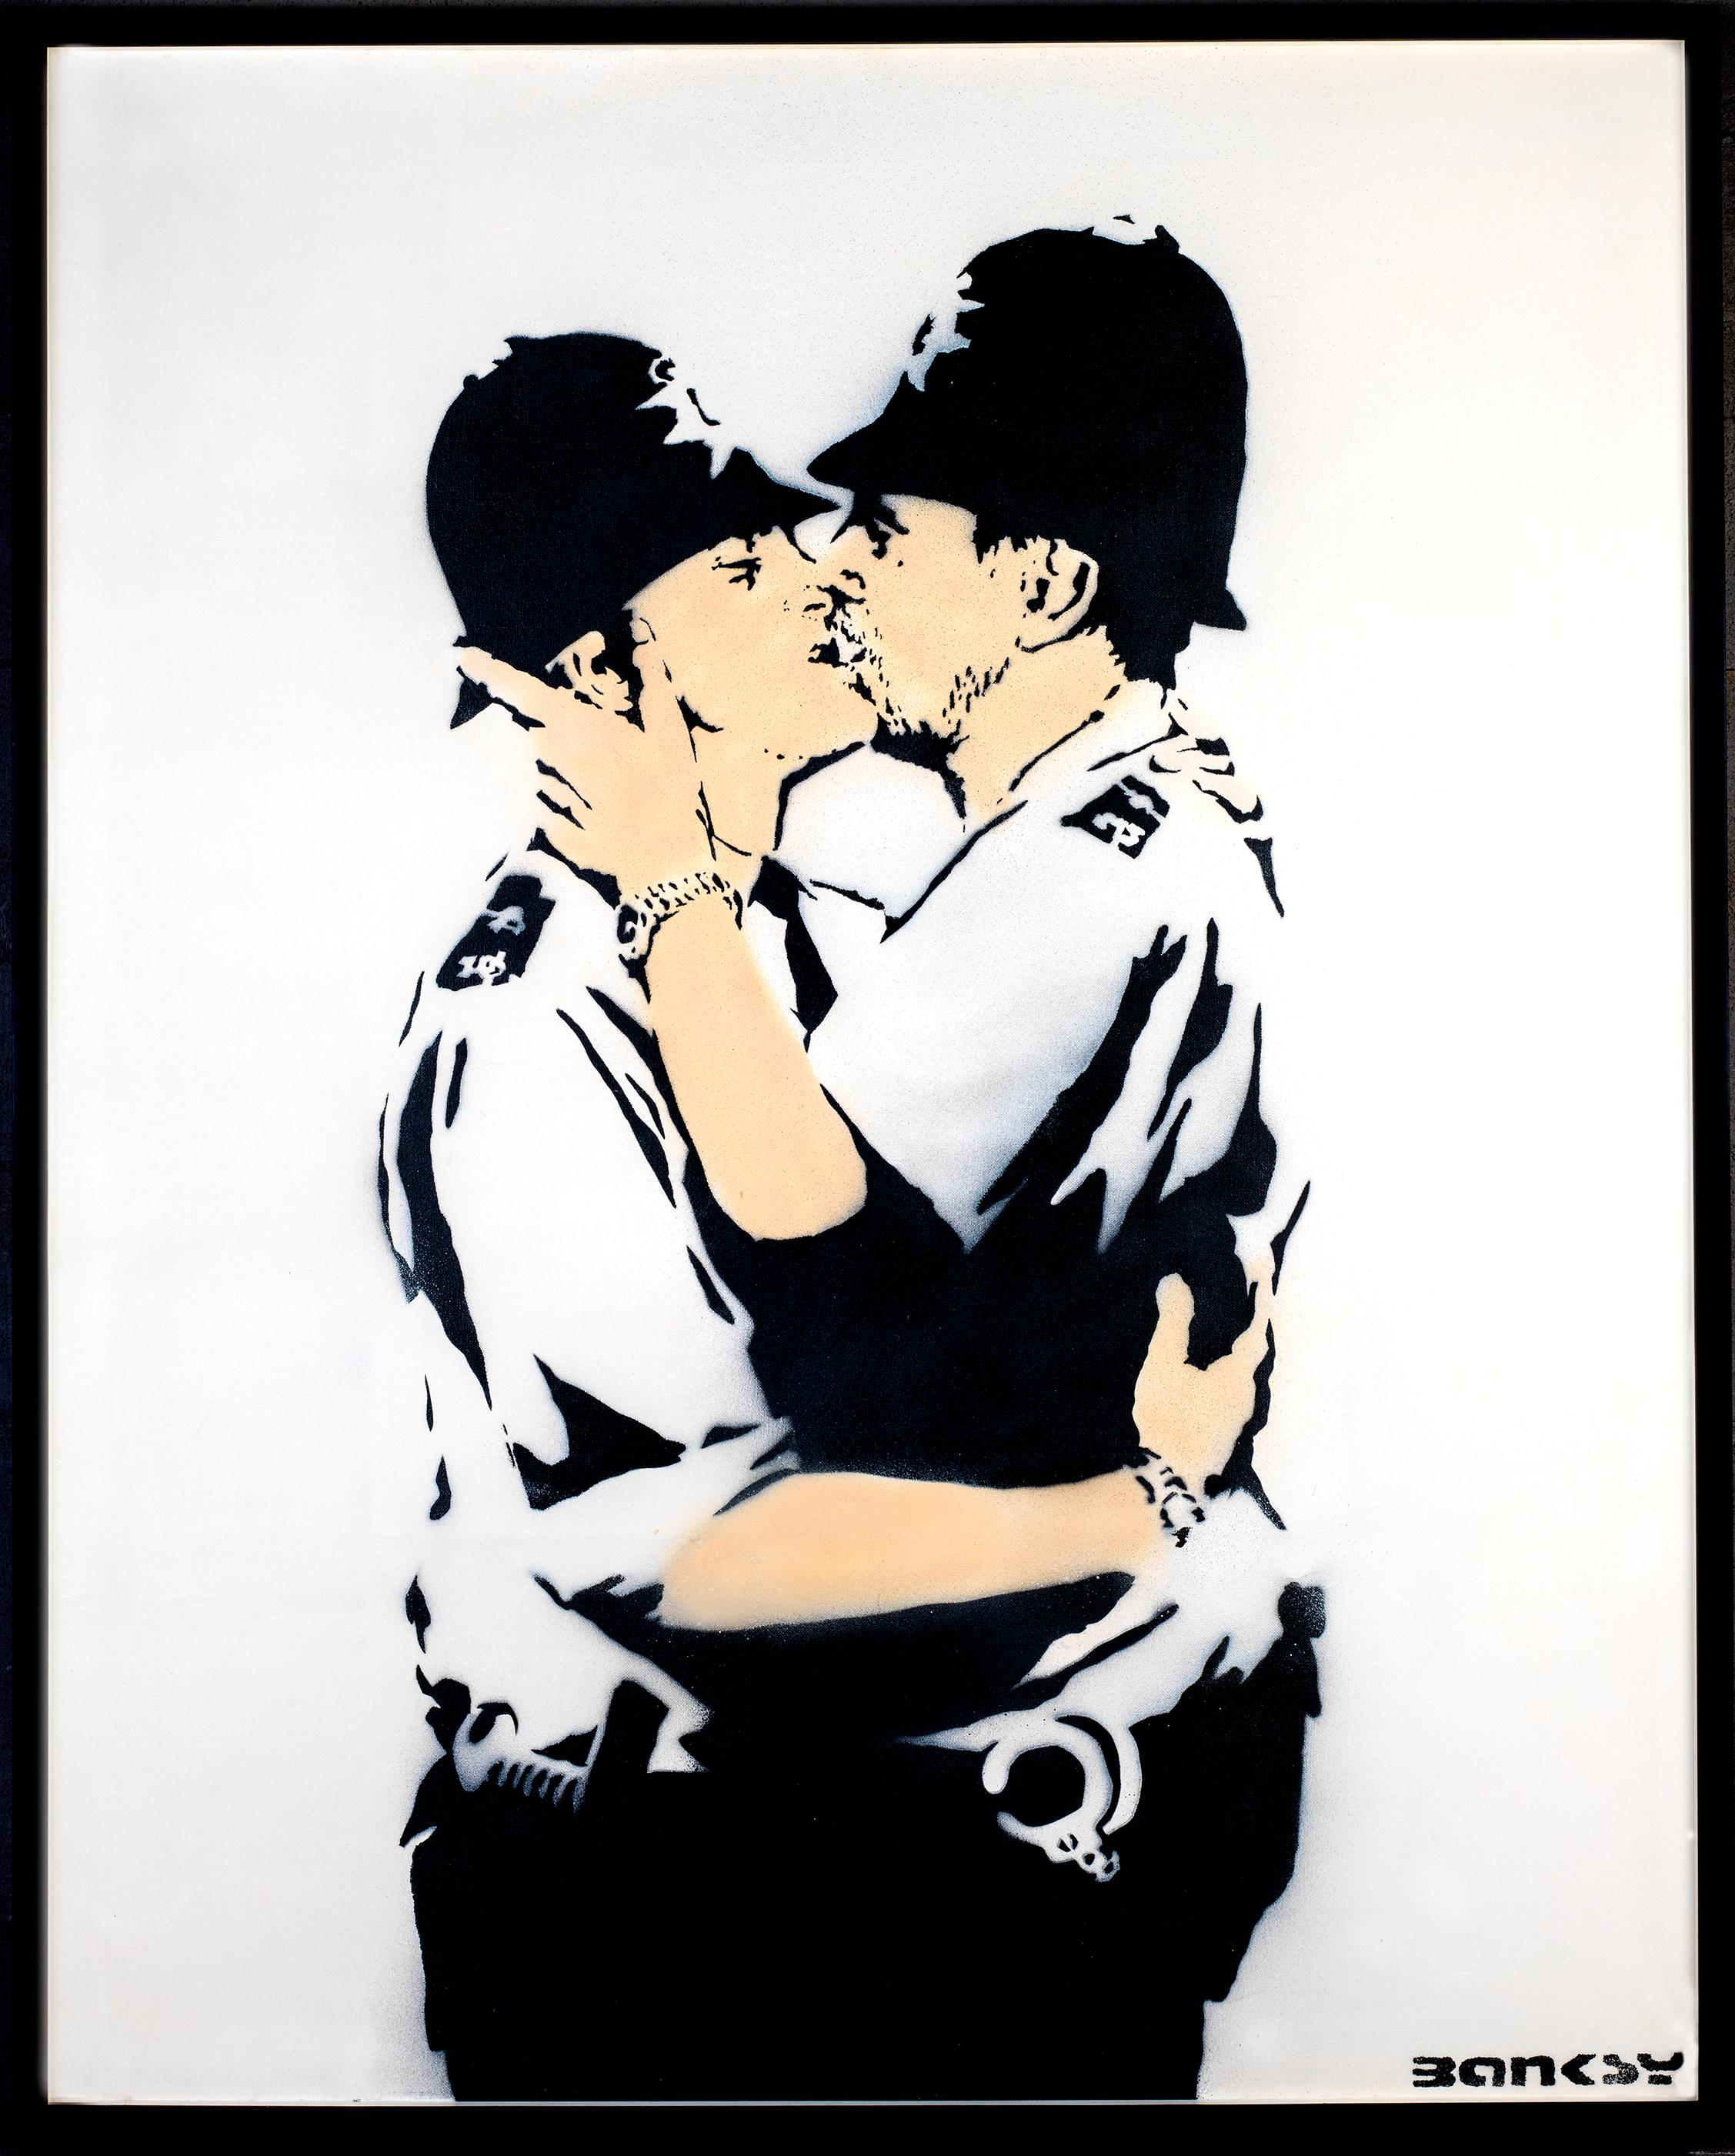 Kissing-Policemen-Banksy.png